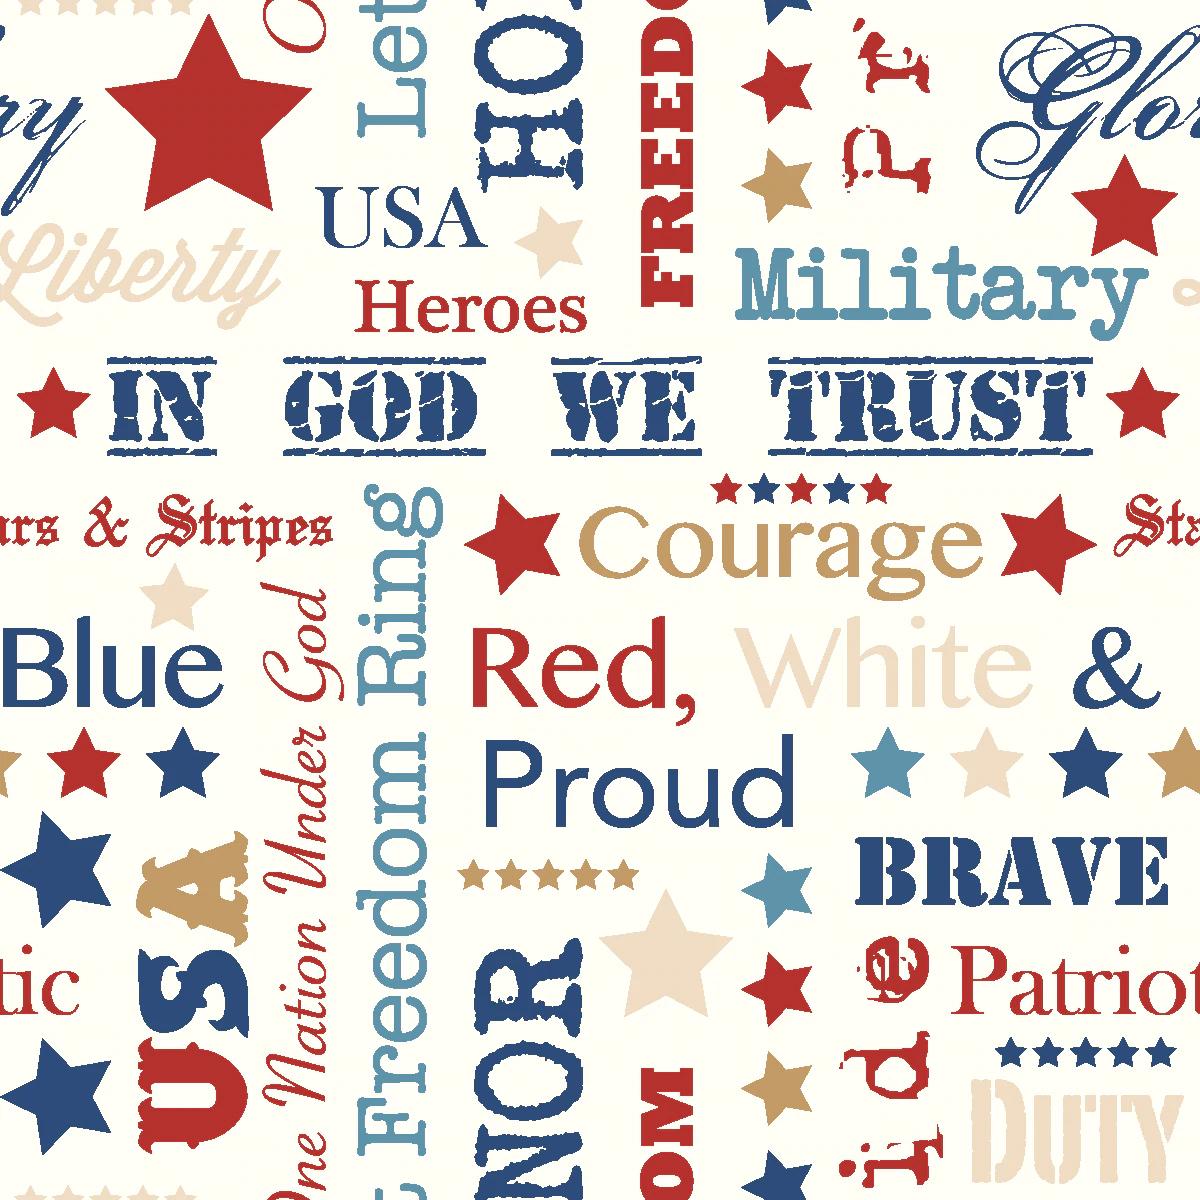 STARS of VALOR -  Patriotic Words